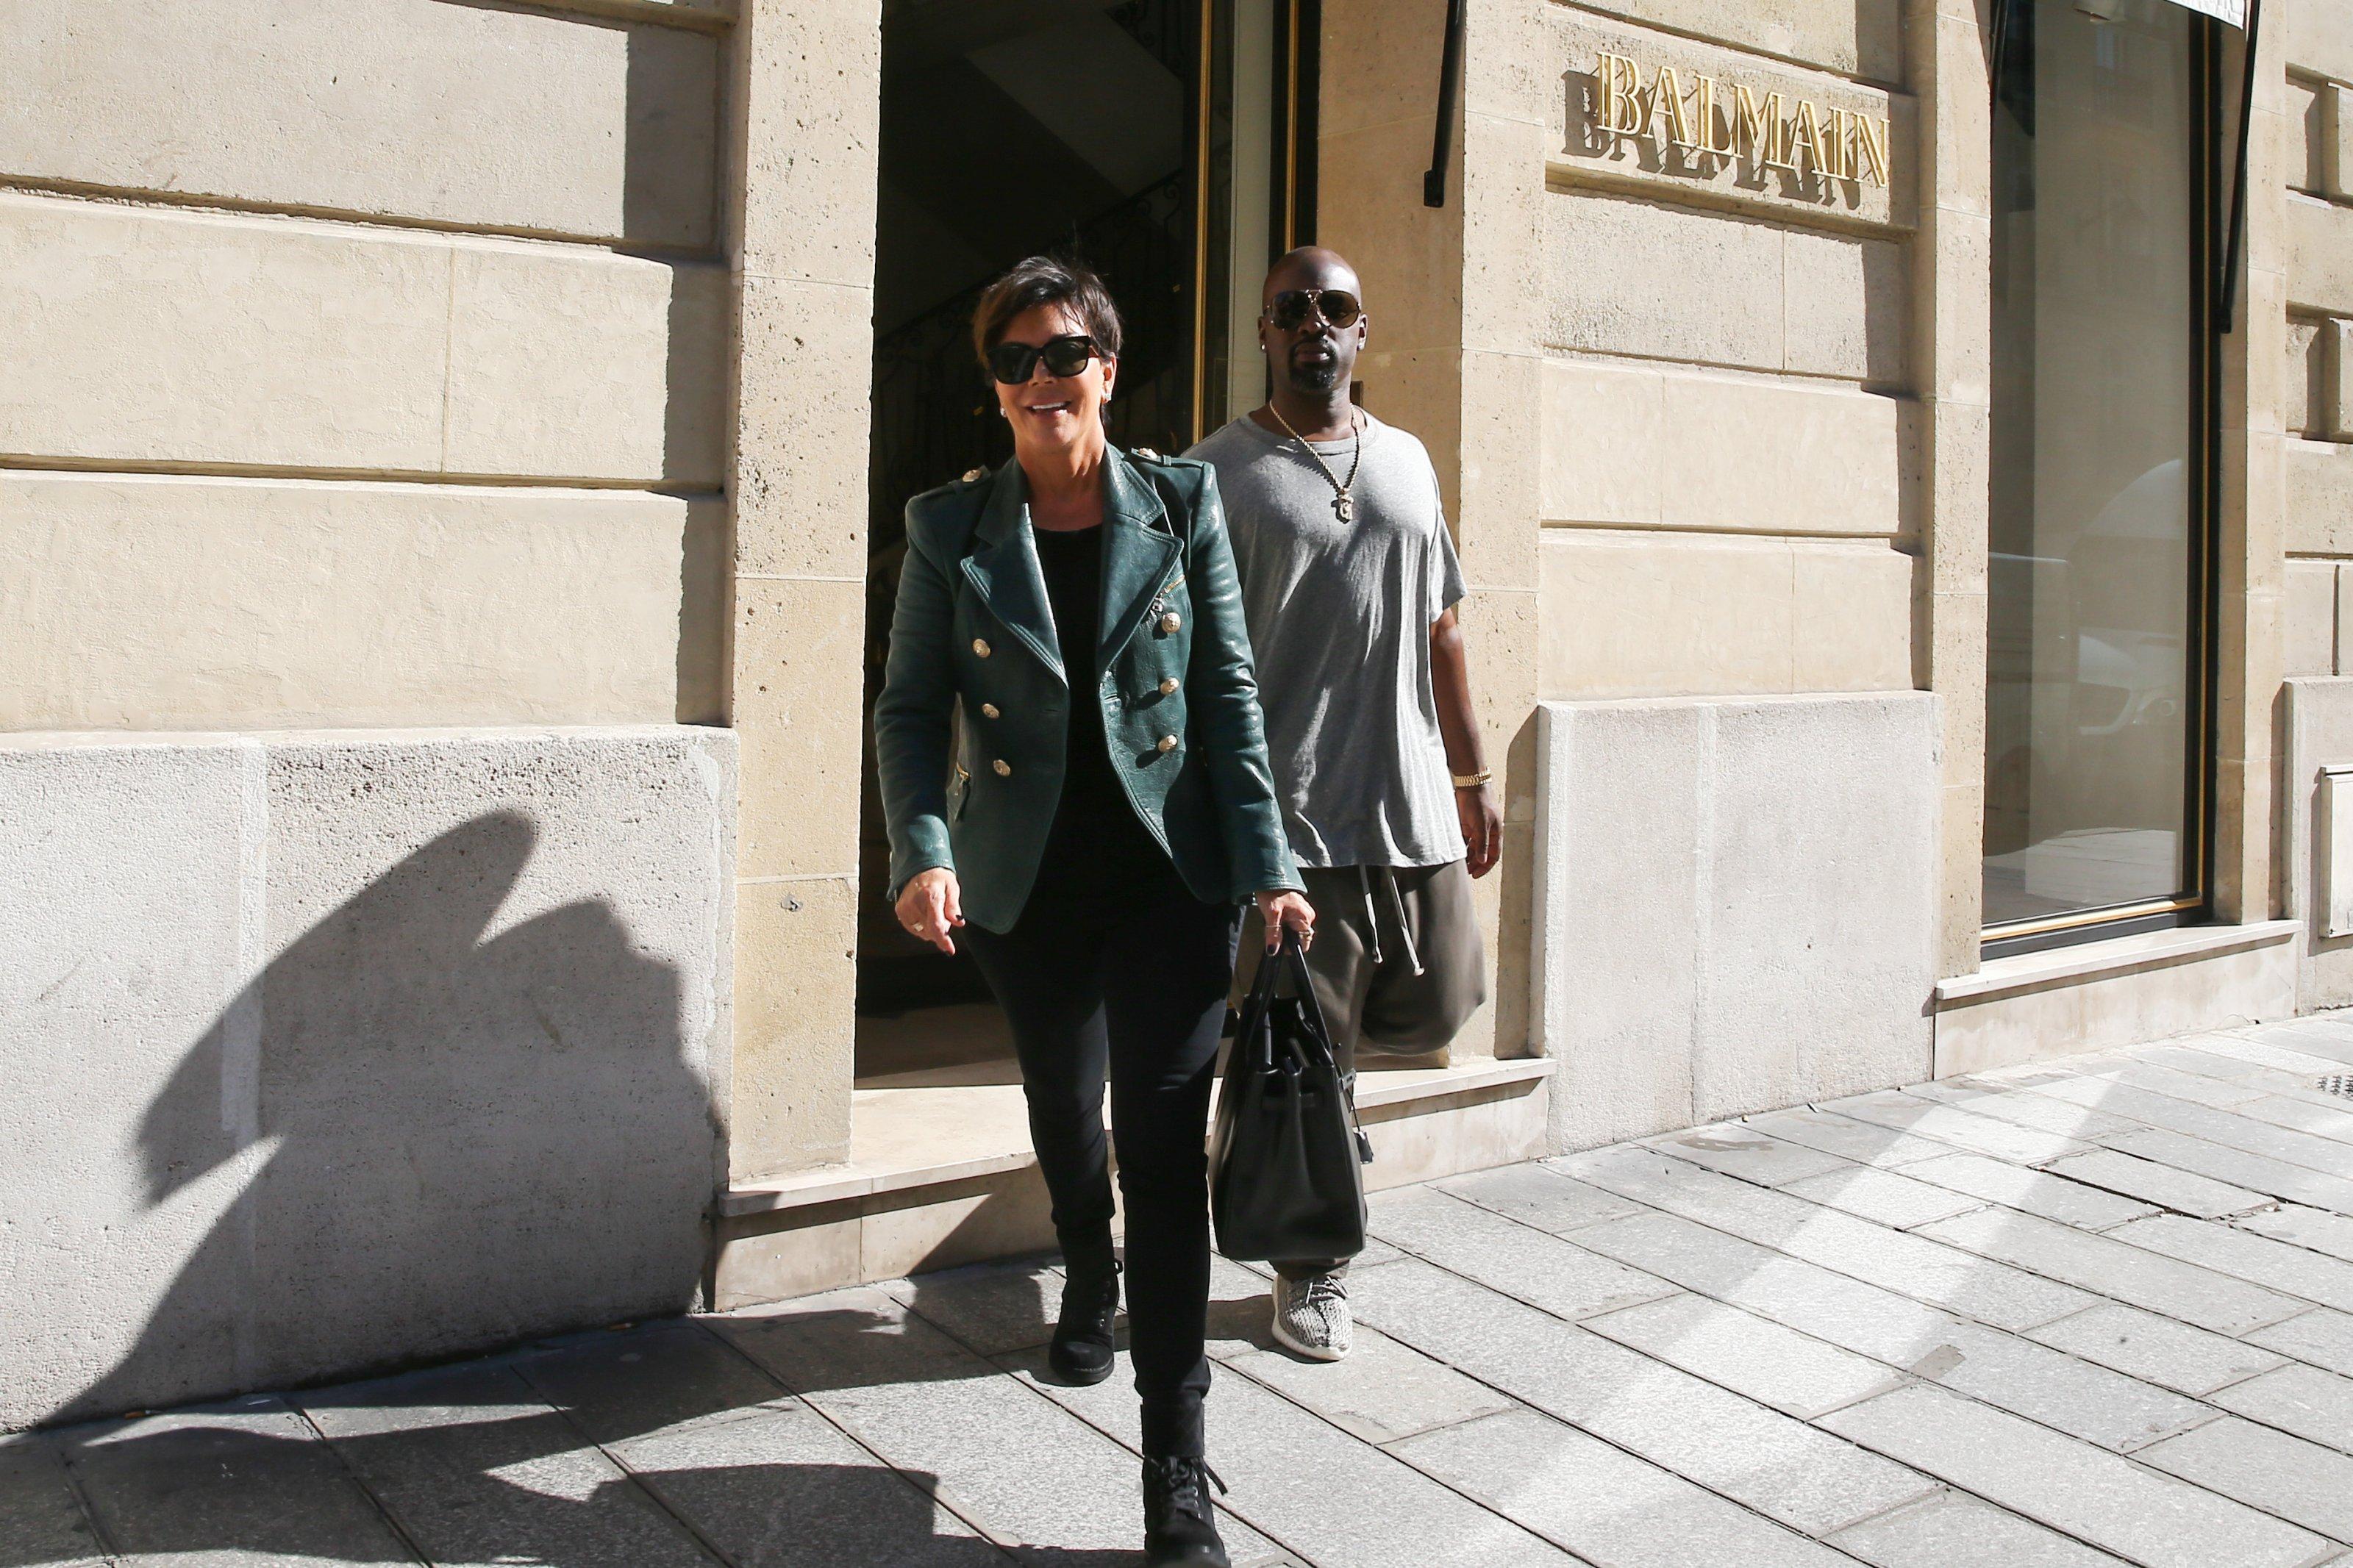 Kris Jenner and her boyfriend Corey Gamble leaving Balmain showroom in Paris, France on September 30, 2015. Photo by ABACAPRESS.COM